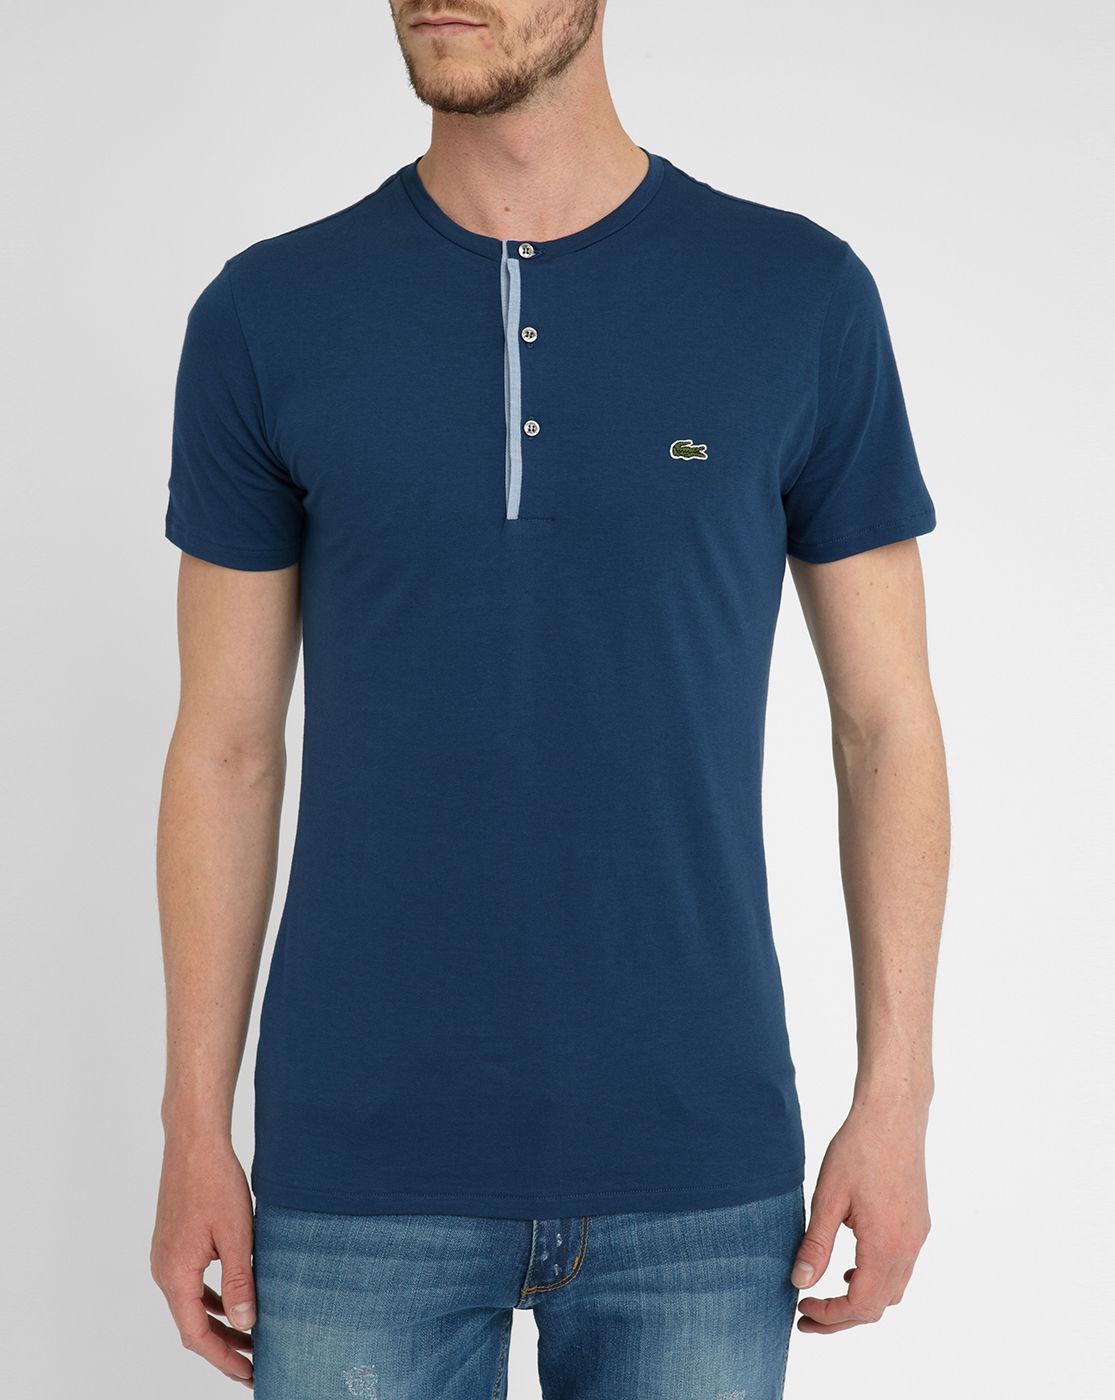 Lacoste navy grandad collar t shirt in blue for men navy Mens grandad collar shirt